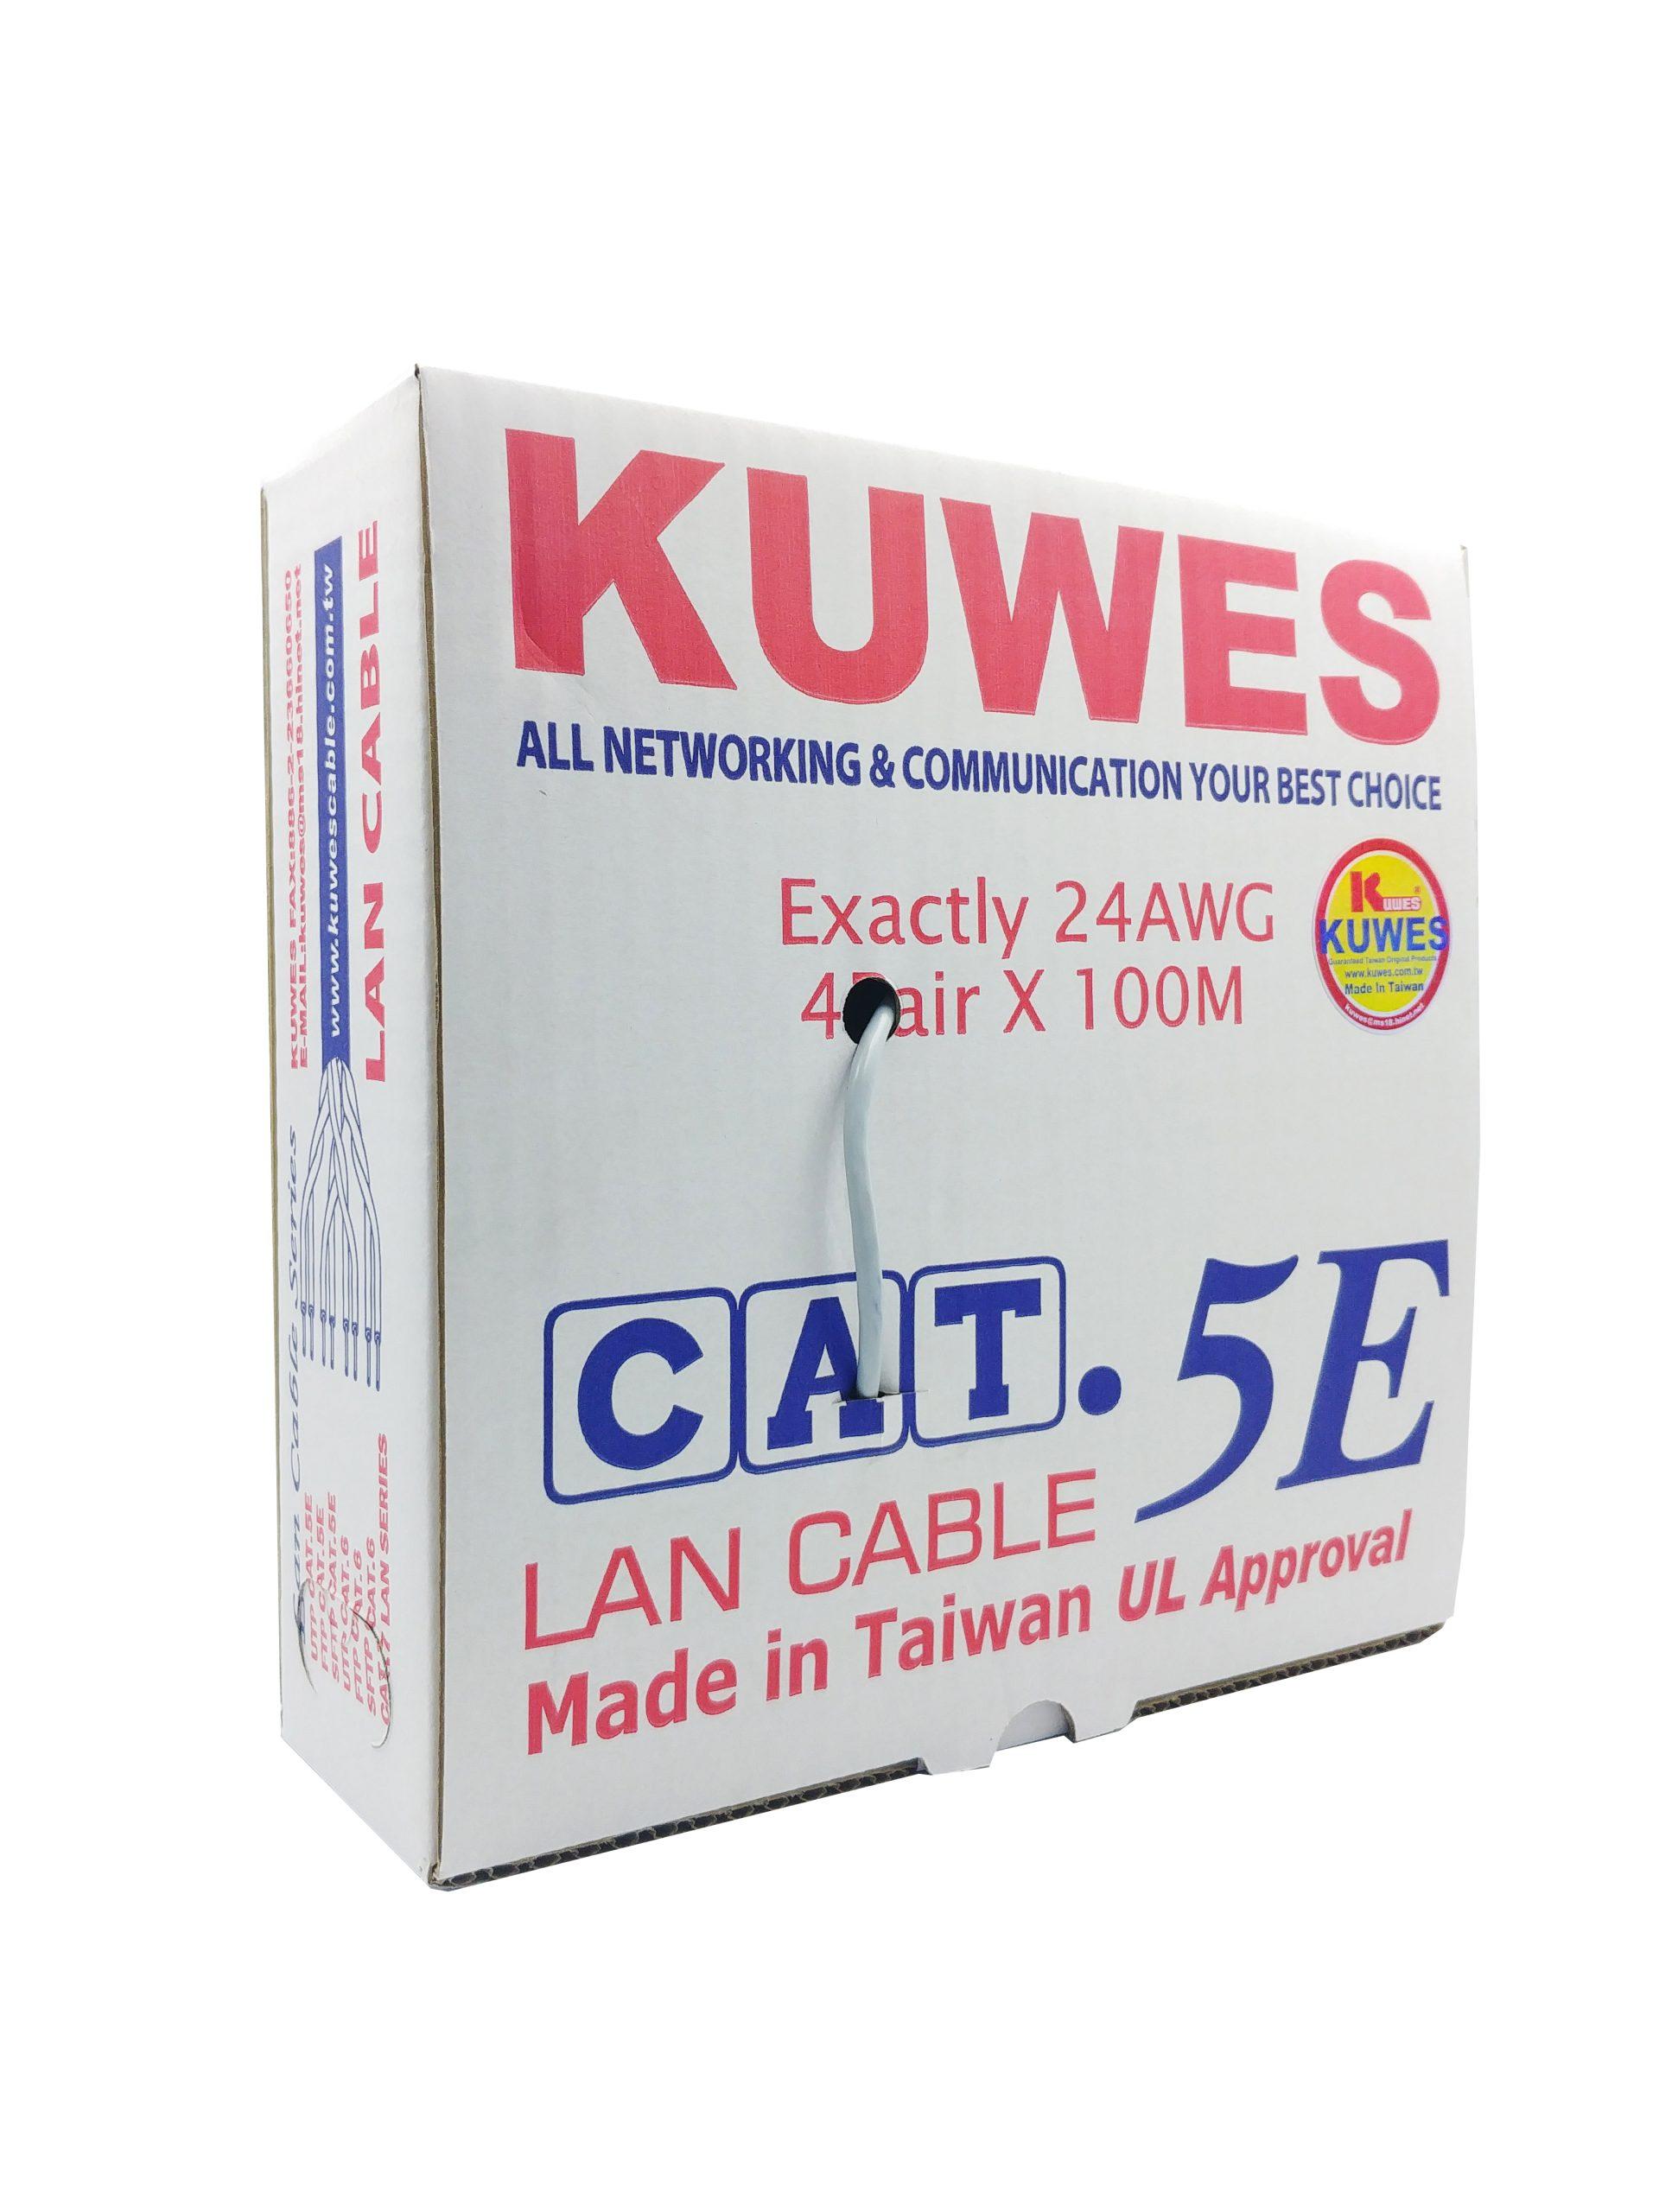 Kuwes CAT5E Plus UTP Pure Copper Cable 100m